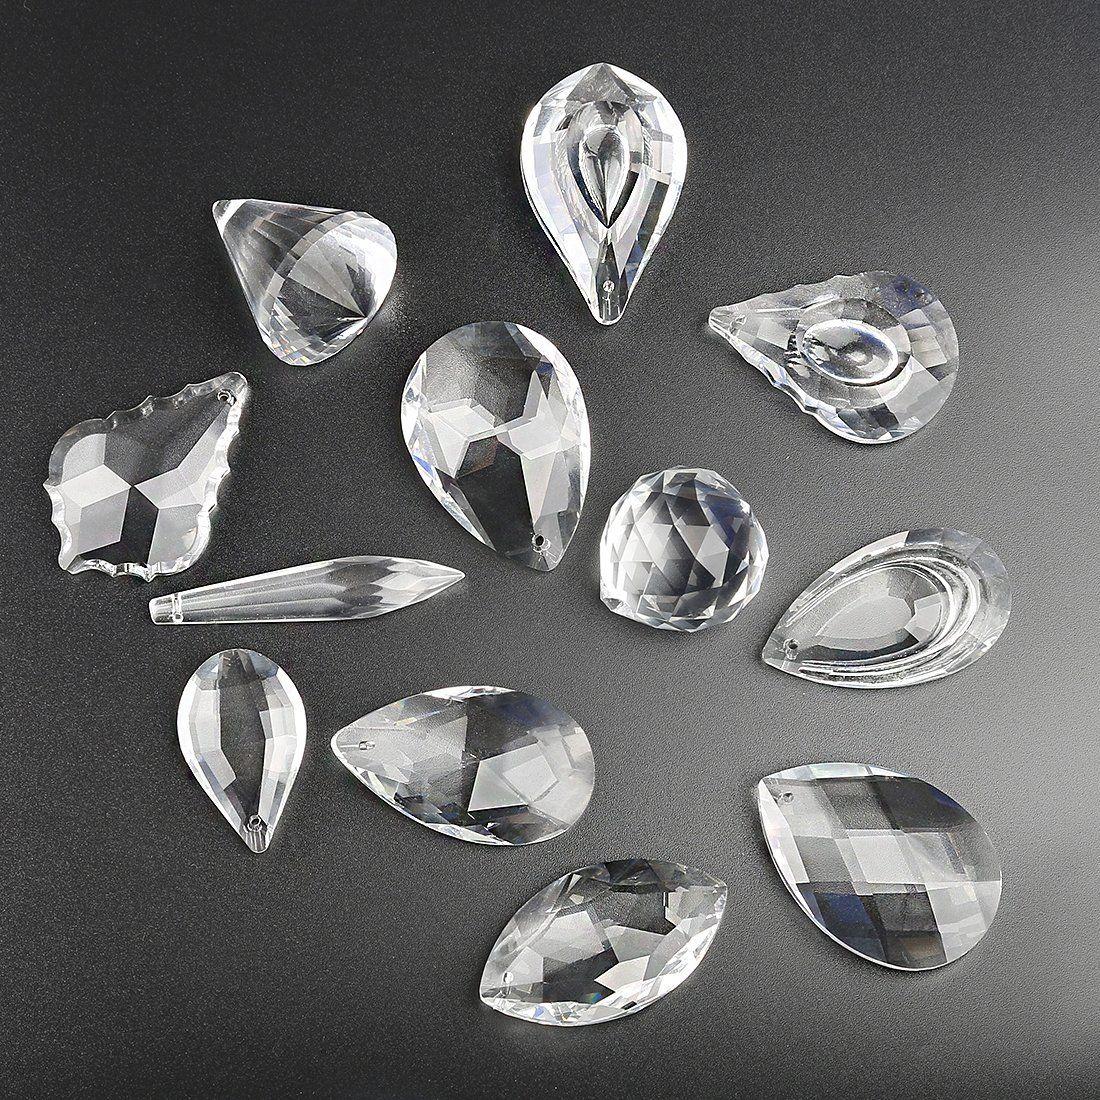 H/&D Pack of 12 Clear Crystal Chandelier Lamp Lighting Drops Pendants Balls Prisms Hanging Glass Prisms Parts Suncatcher Home//House Decor